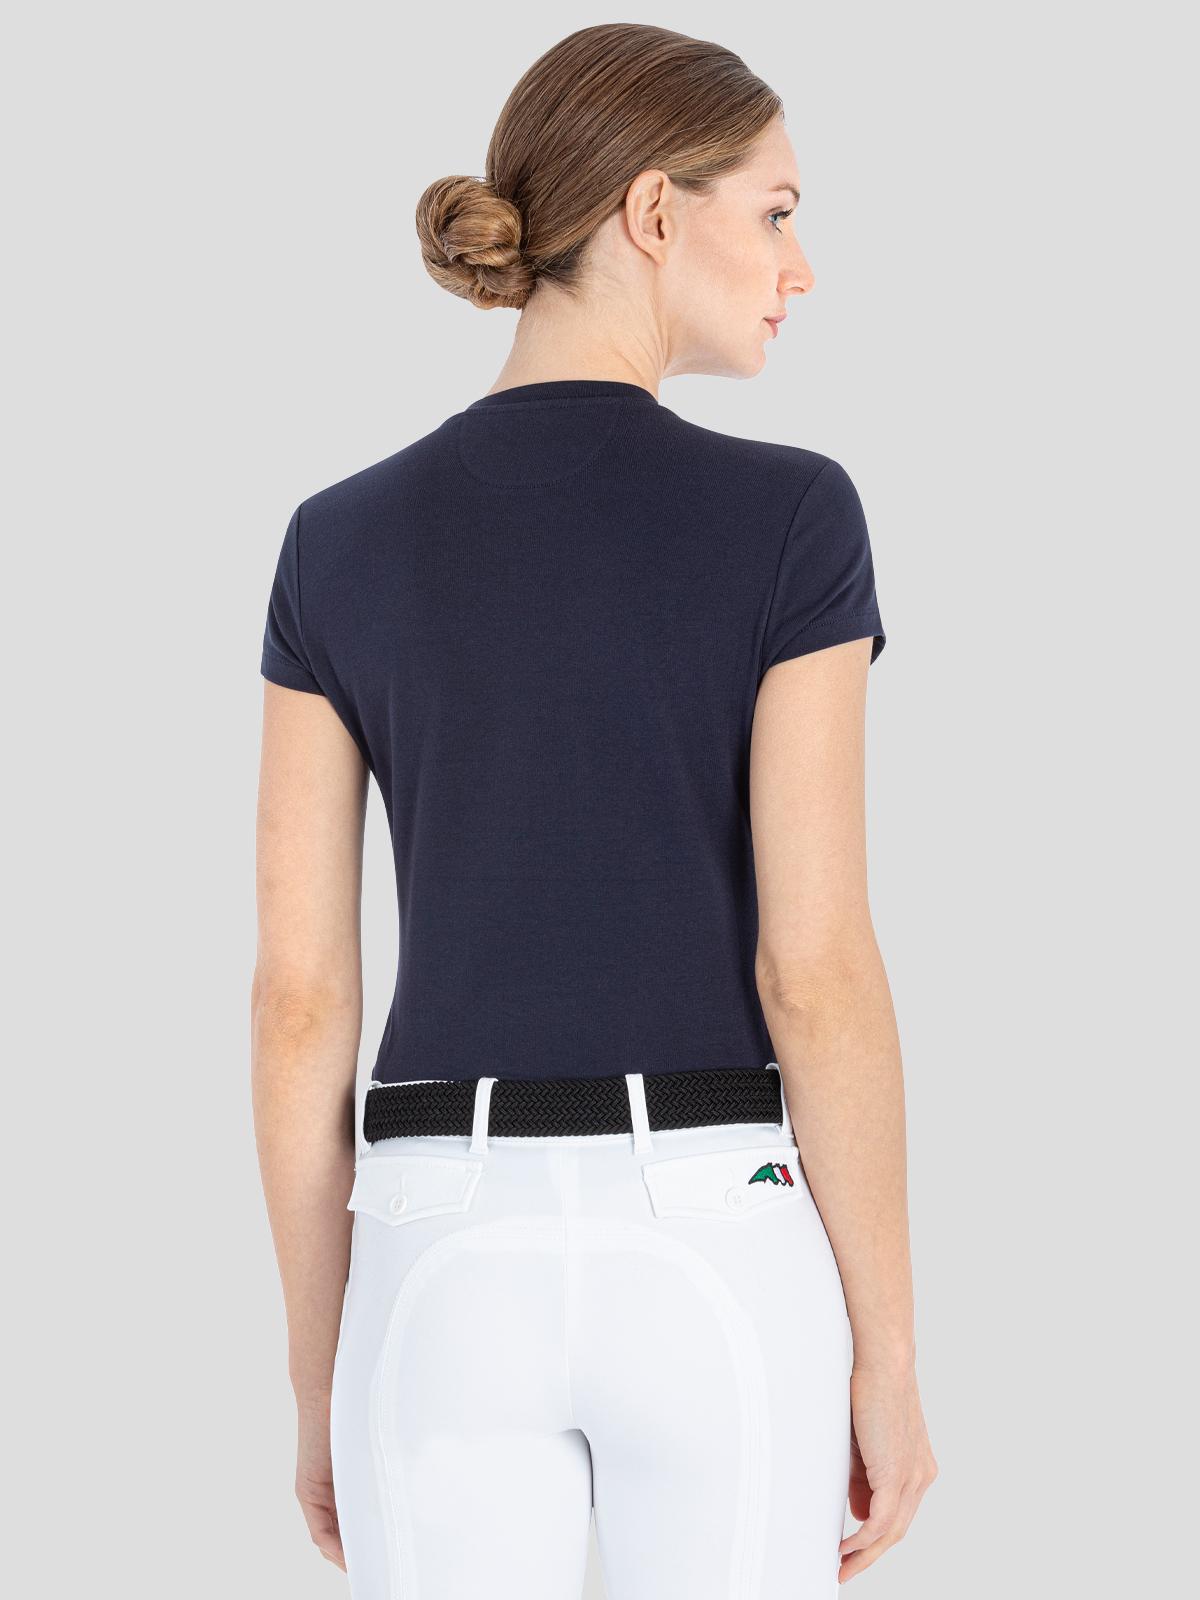 CeliaC Women's Comfort T-Shirt with Logo 2